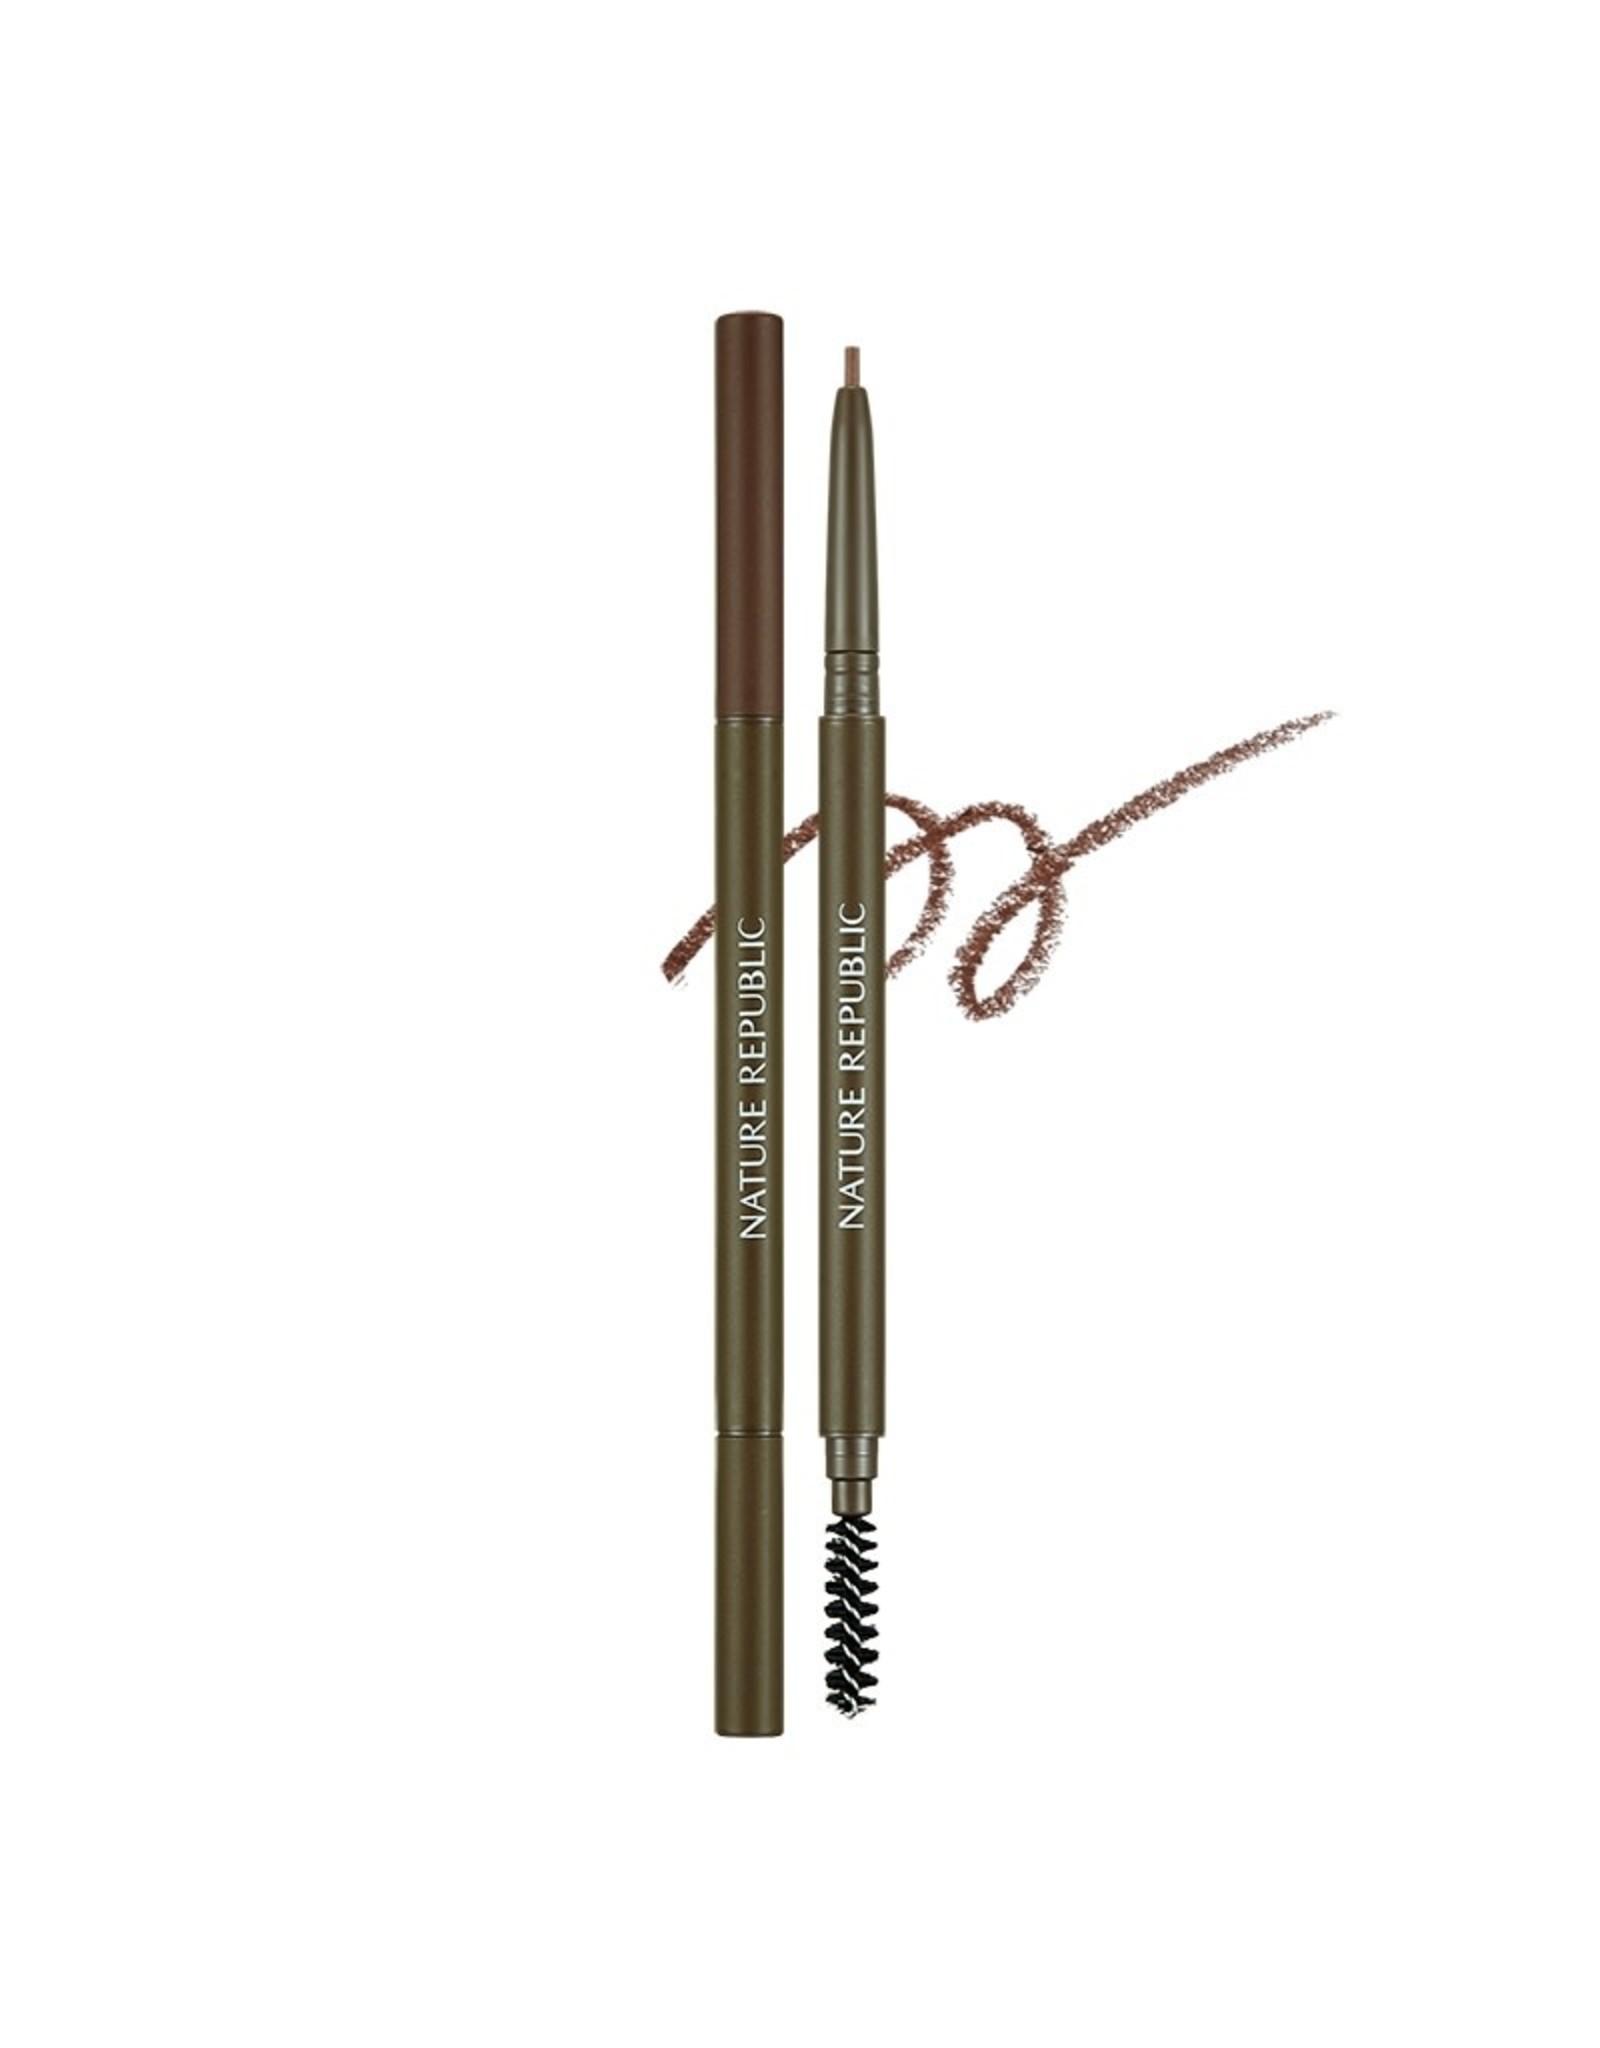 Micro Slim Brow Pencil 02 Redbean Brown